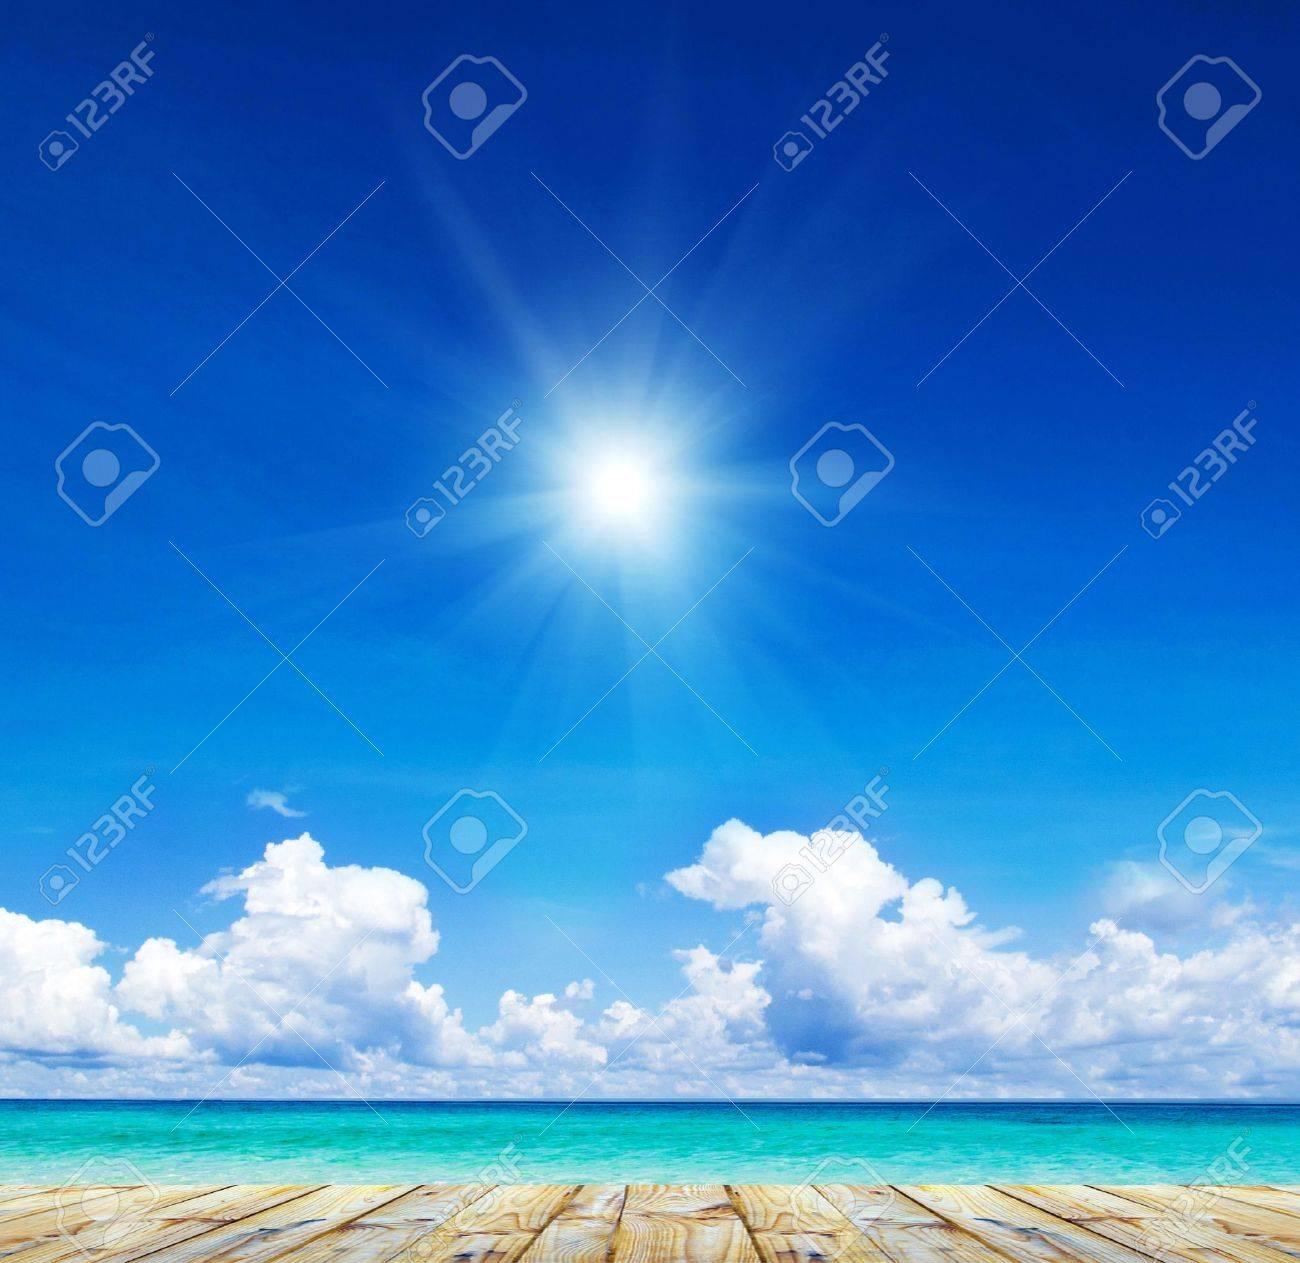 beautiful beach and tropical sea Stock Photo - 15635873